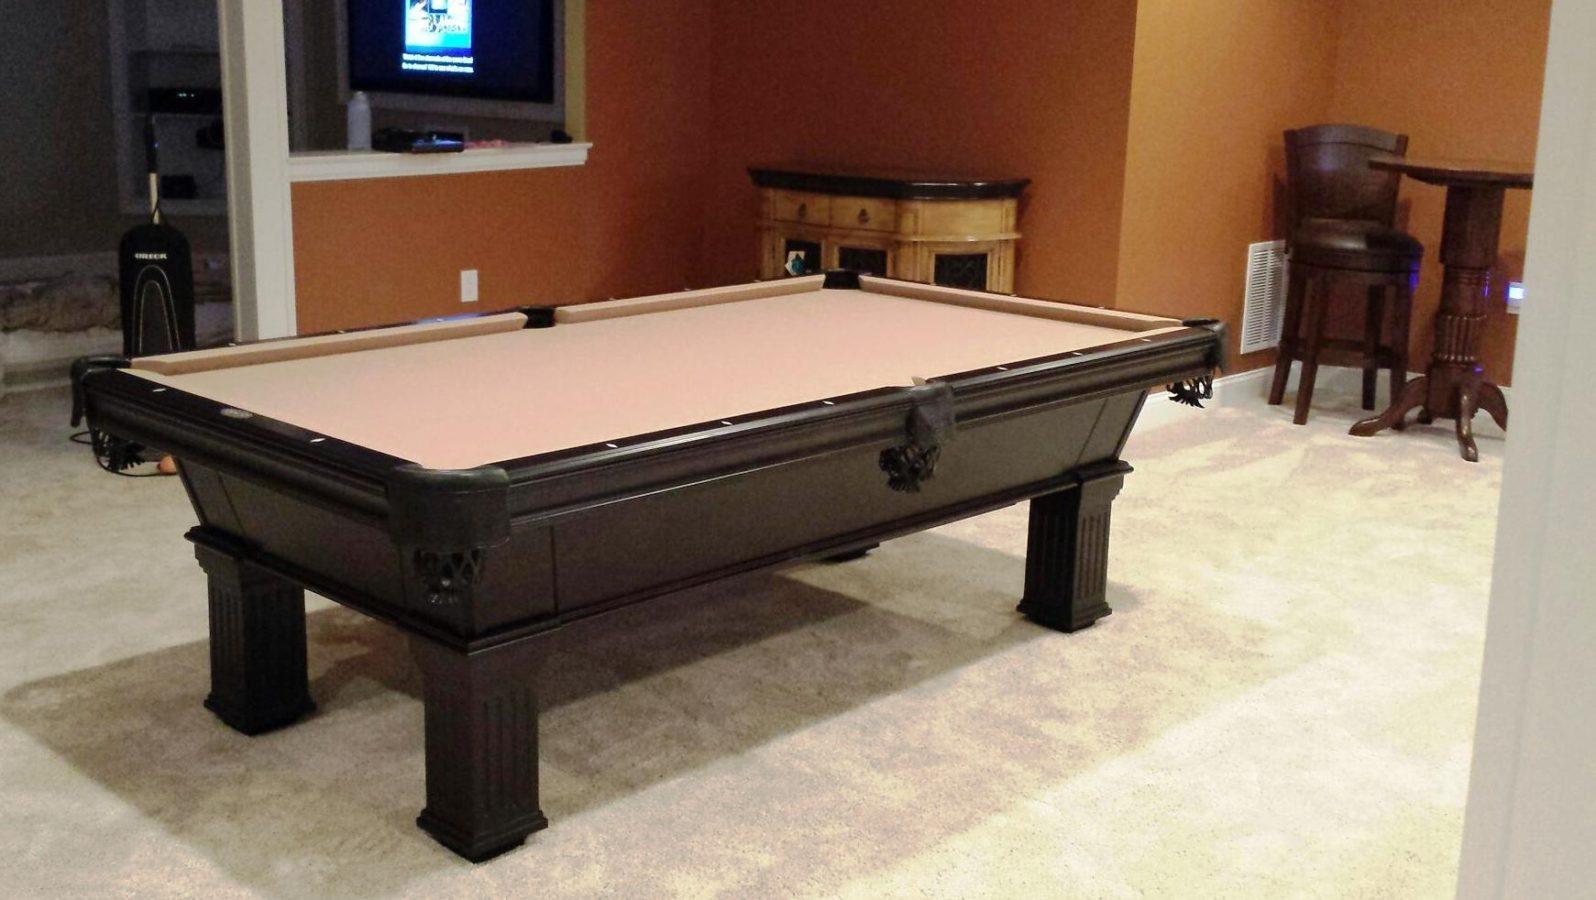 New Nashville Pool Table Olhausen Montgomeryville Pa